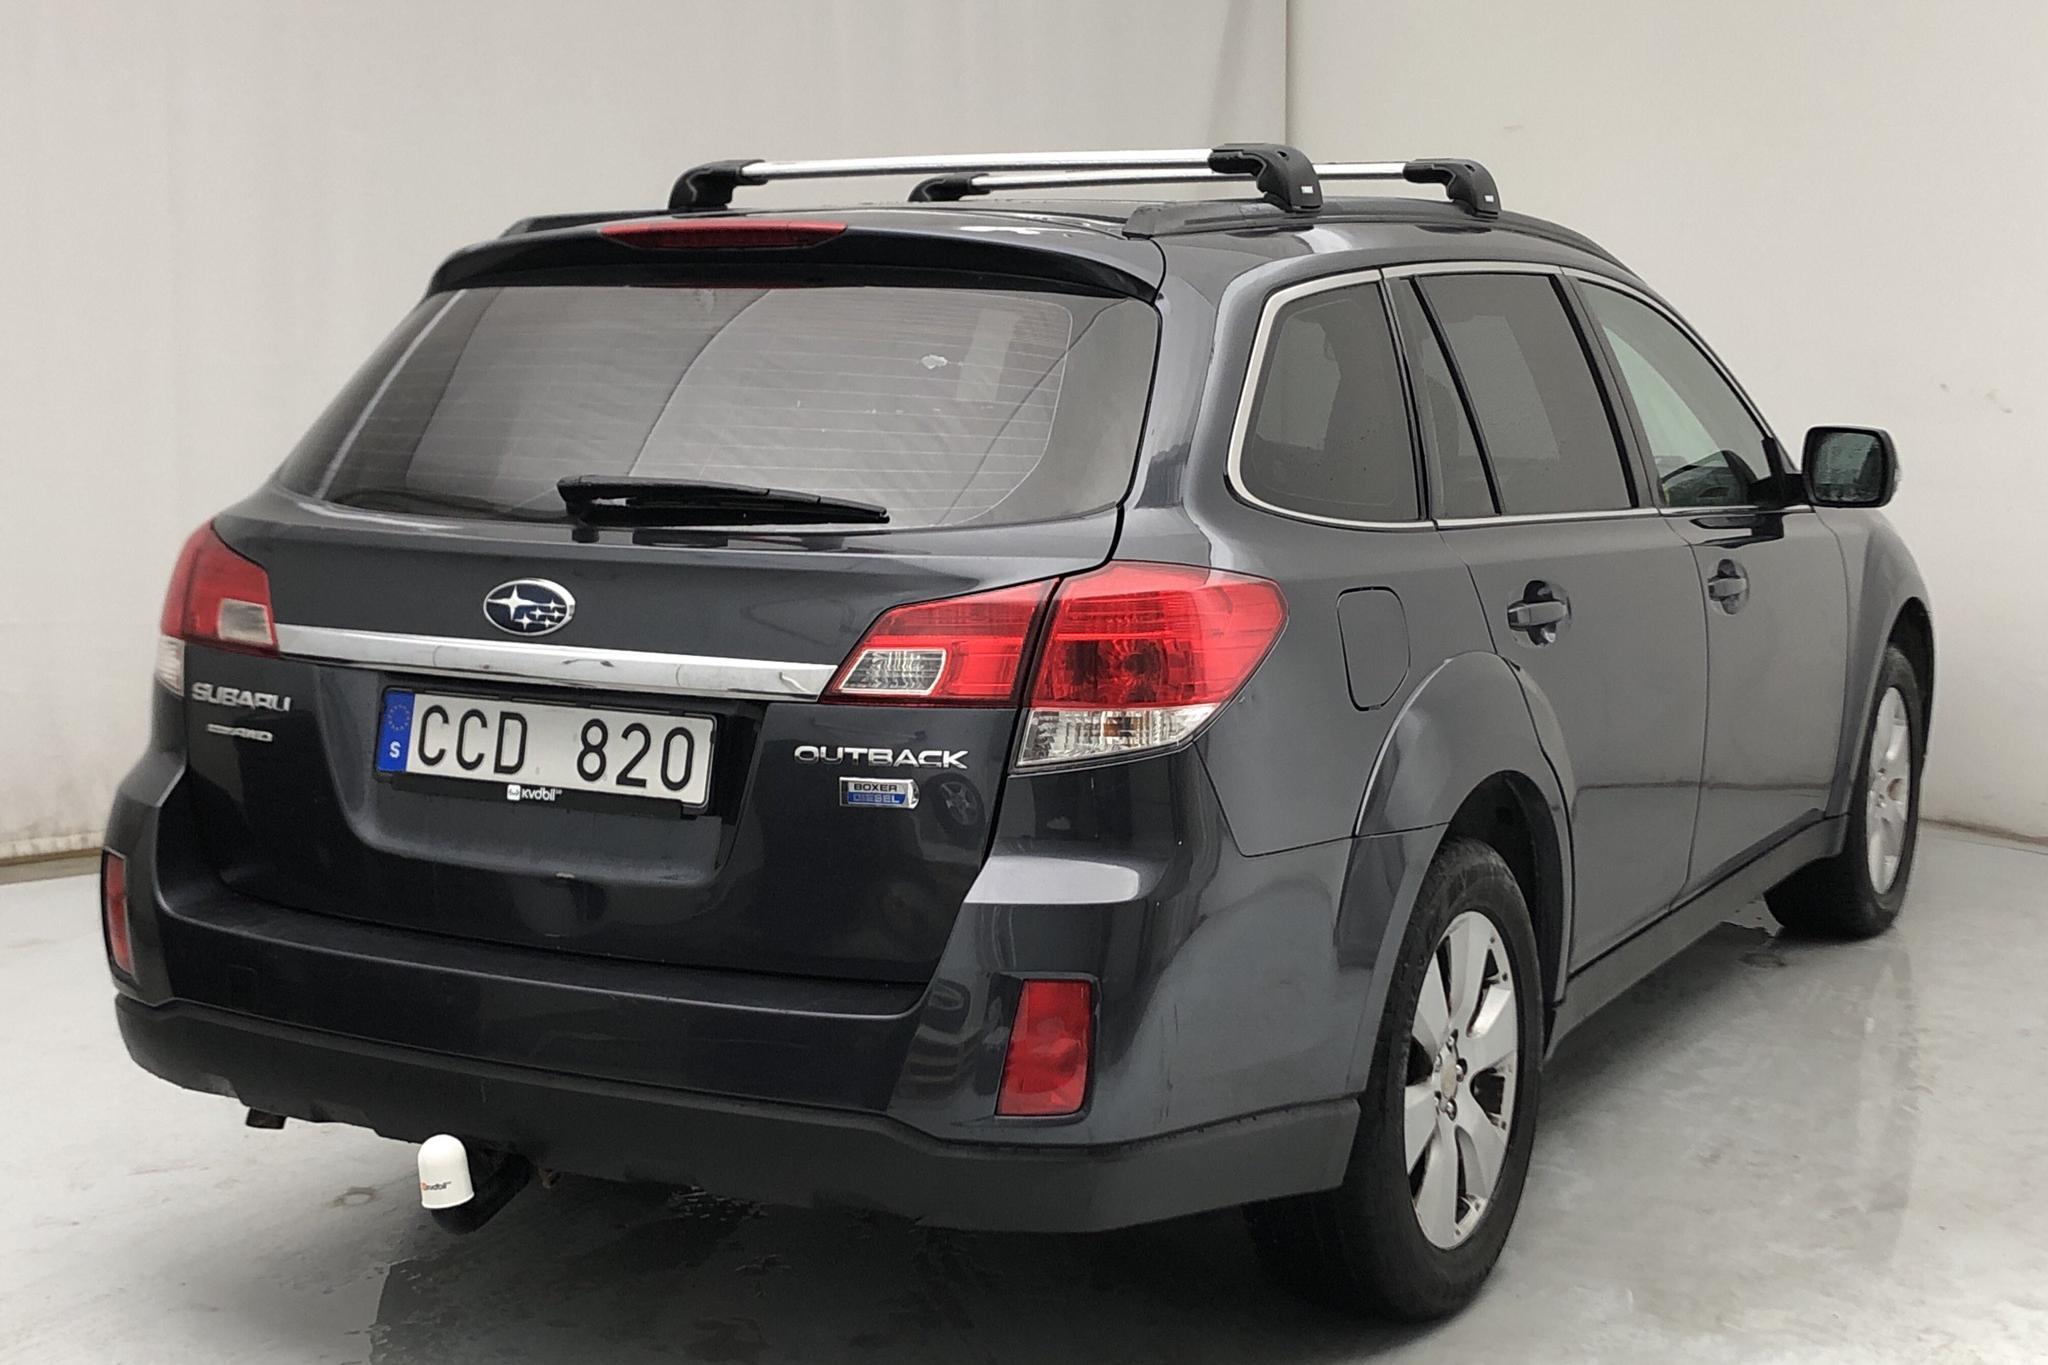 Subaru Outback 2.0D (150hk) - 239 050 km - Manual - Dark Grey - 2011